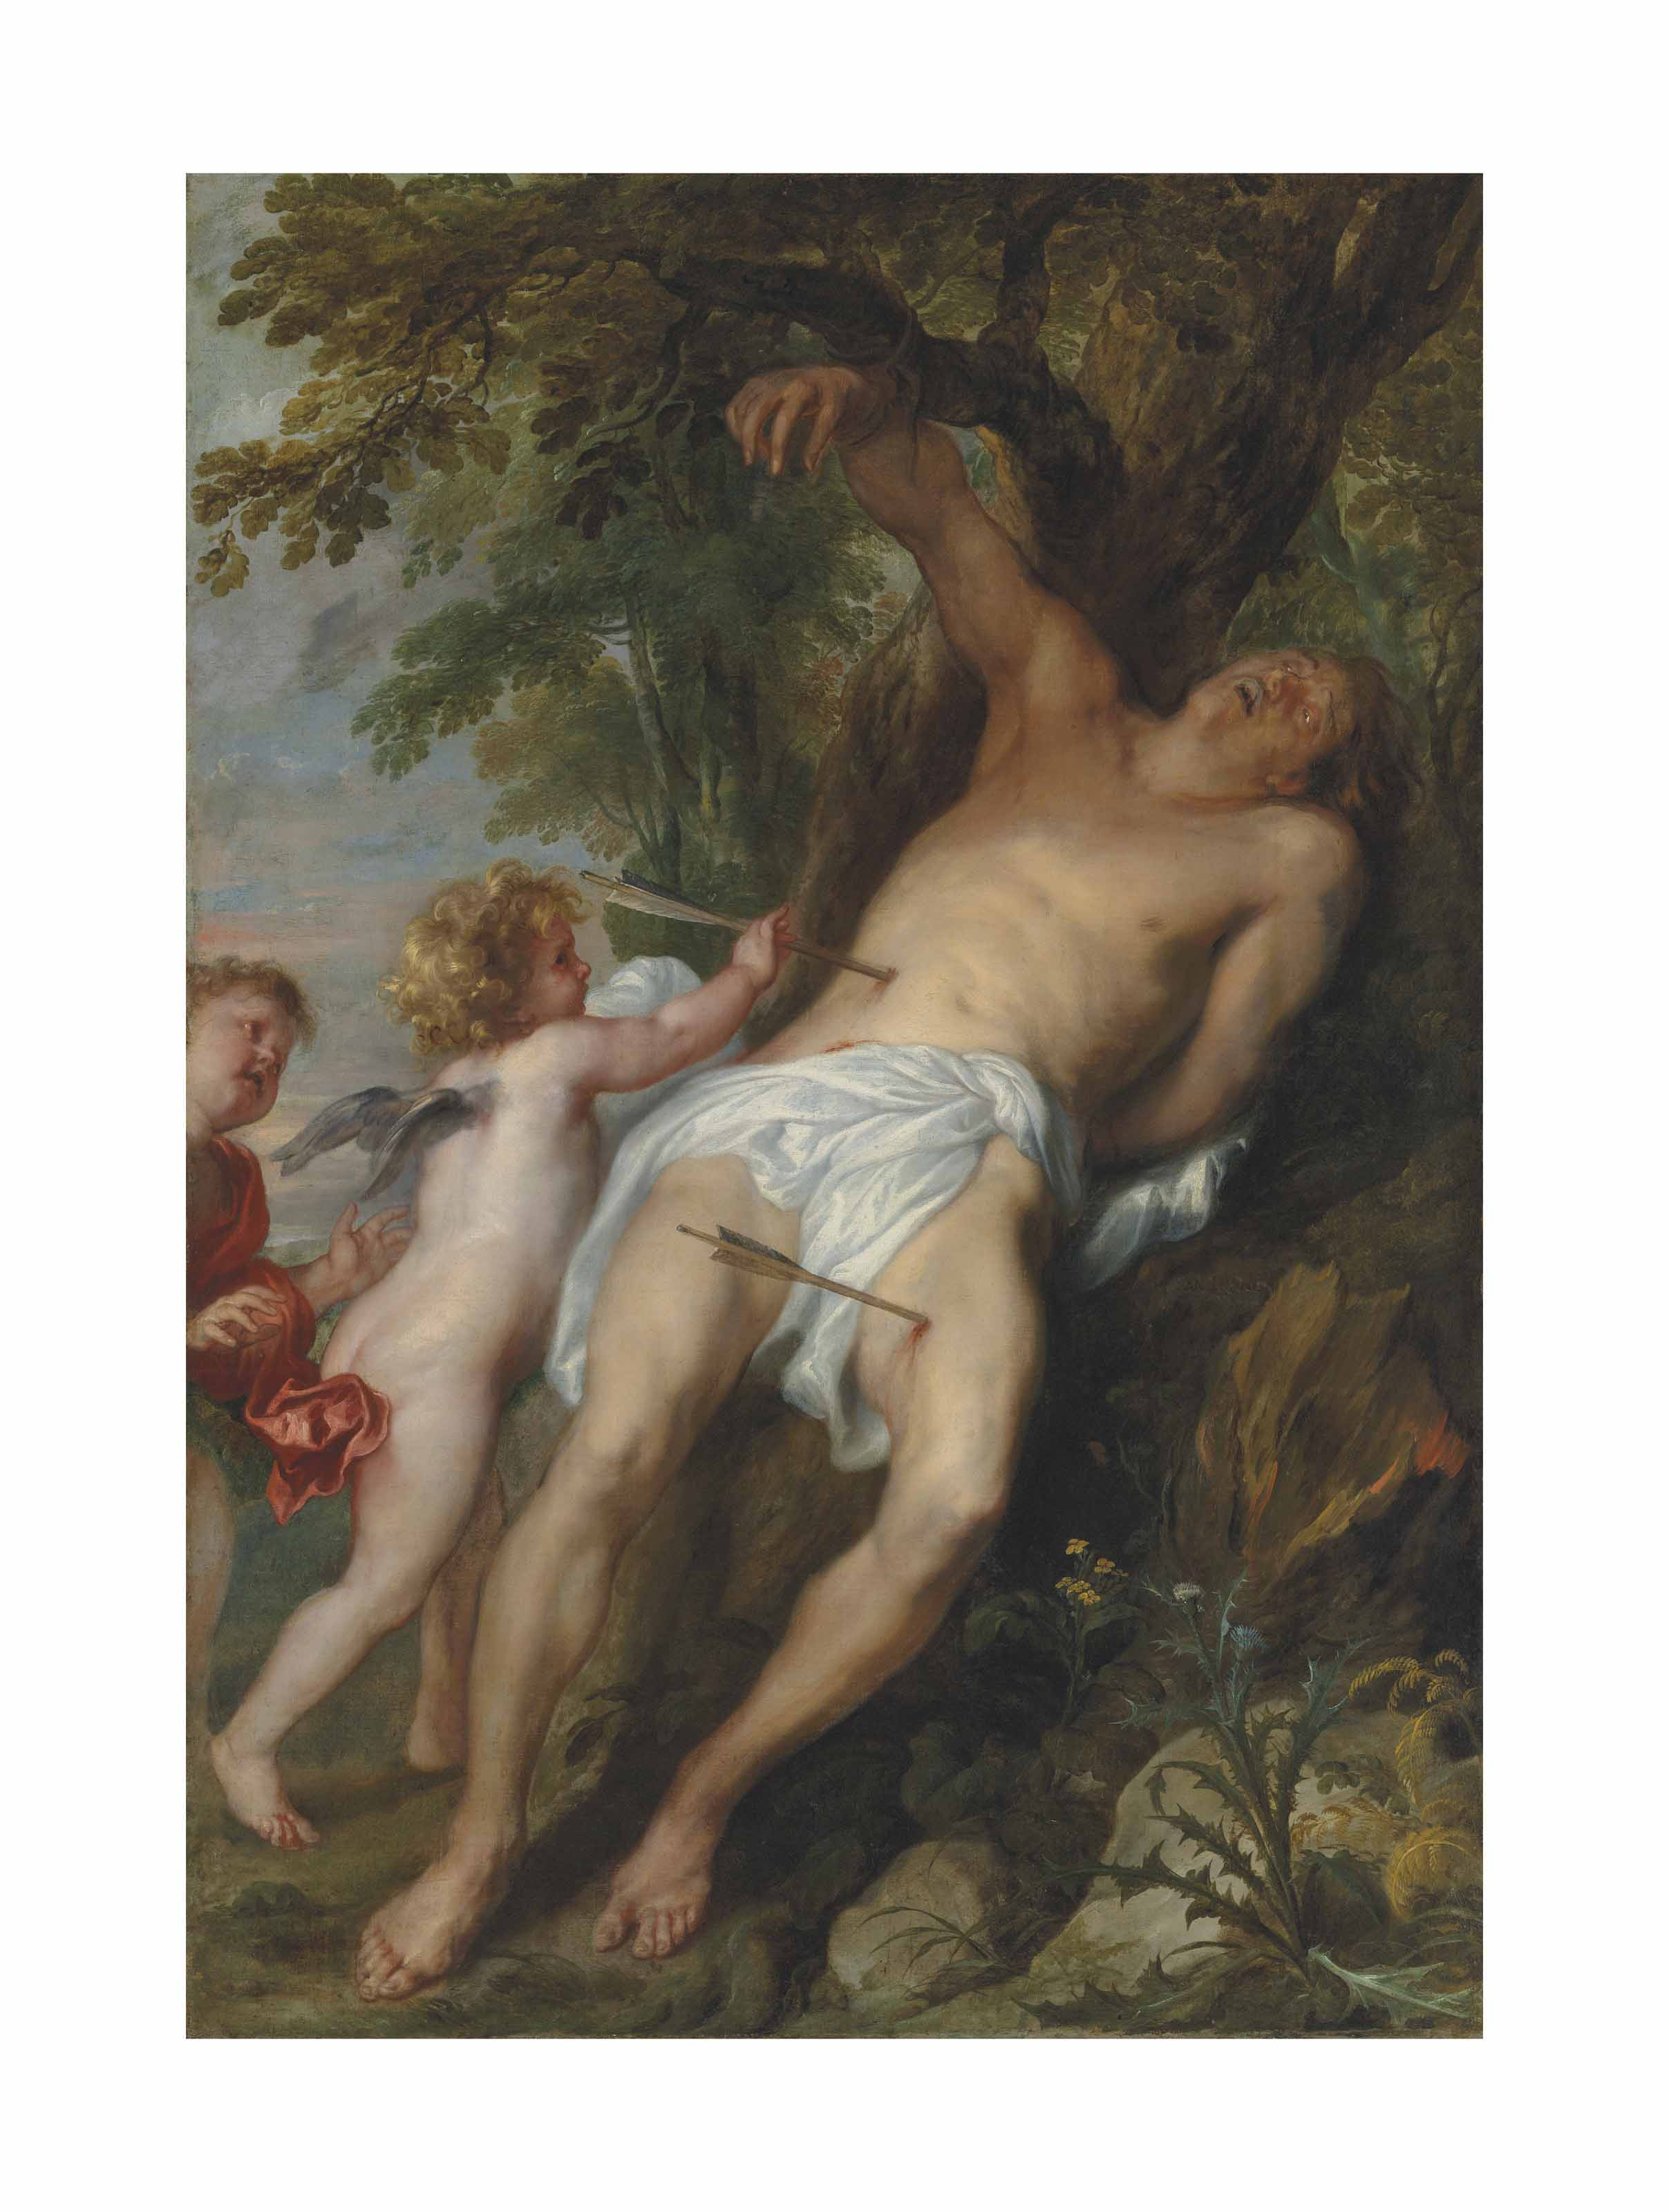 Saint Sebastian after His Ordeal